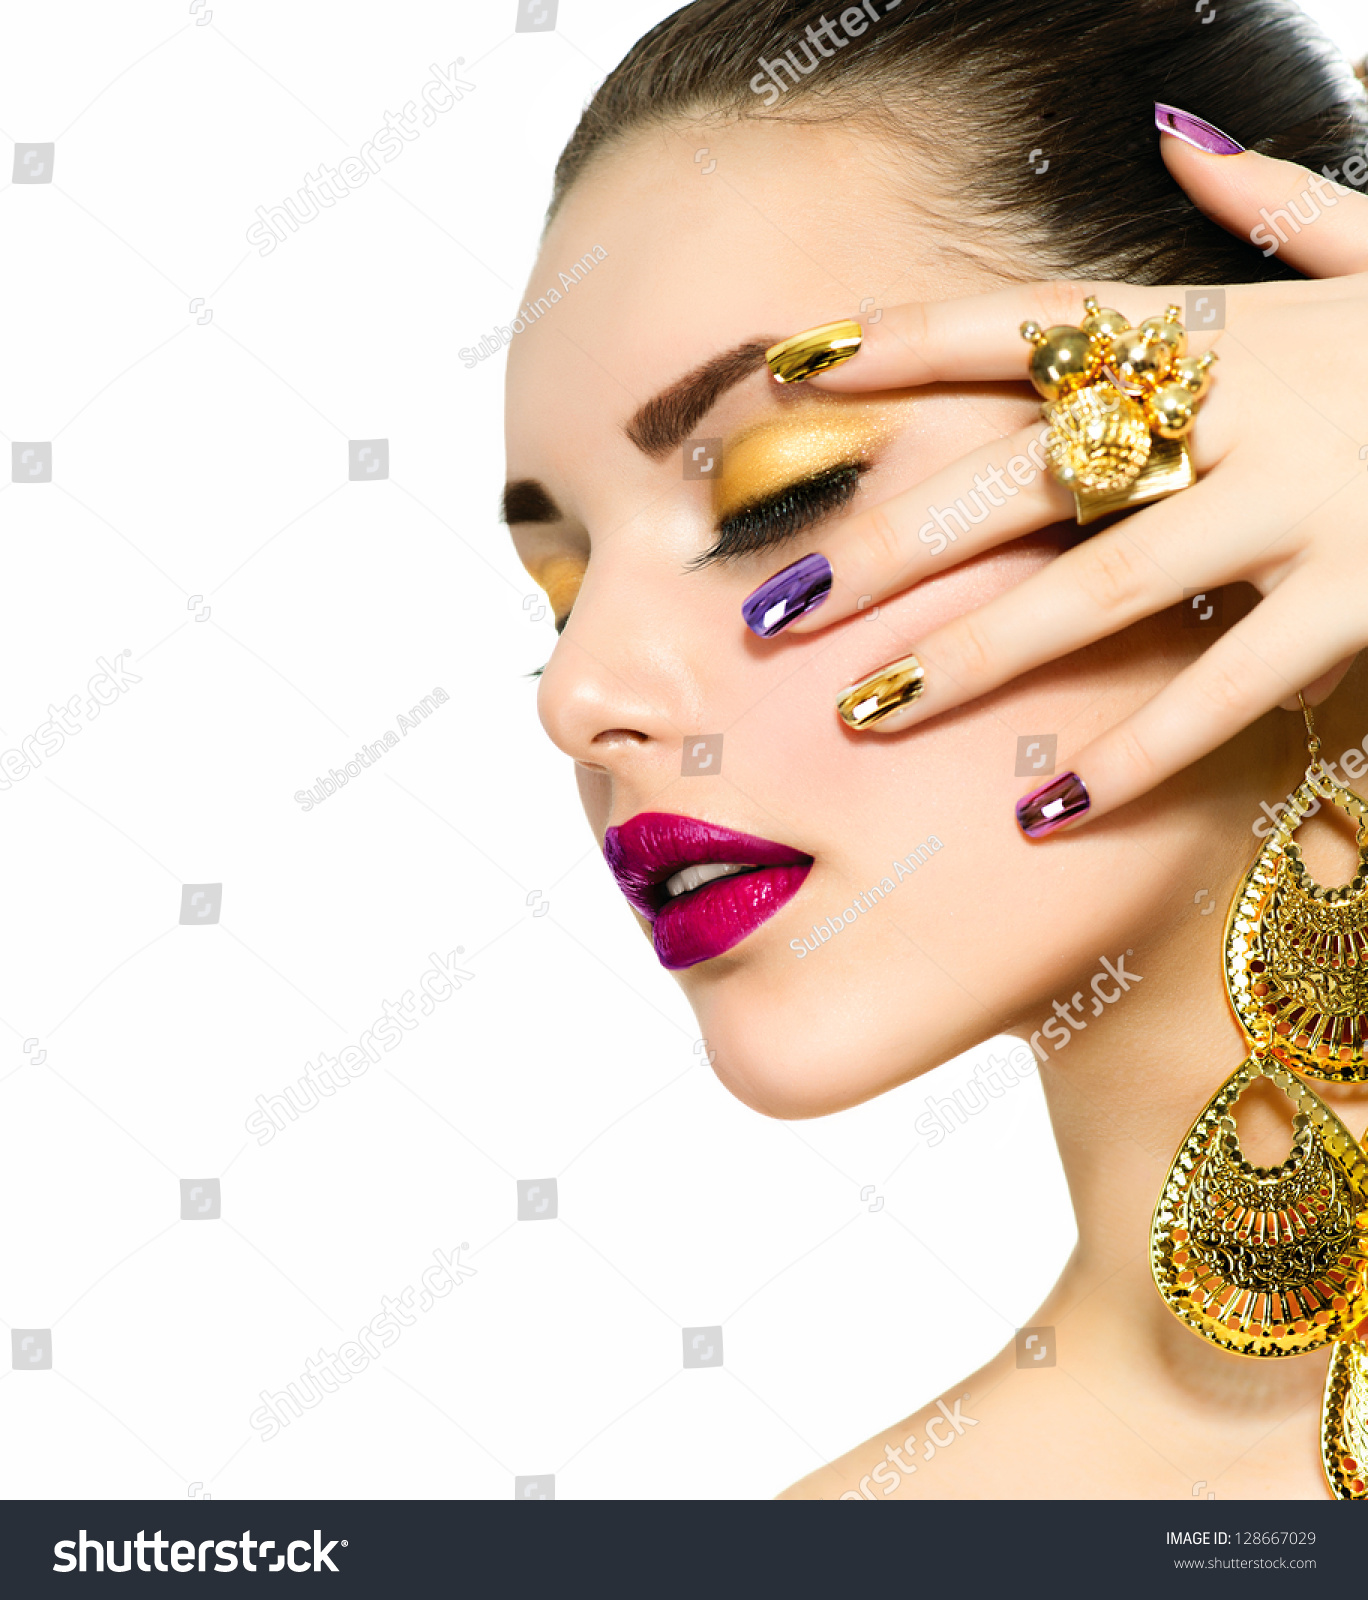 Free Manicure Beauty Hands Makeover: Fashion Beauty . Manicure And Make-Up. Nail Art. Beautiful